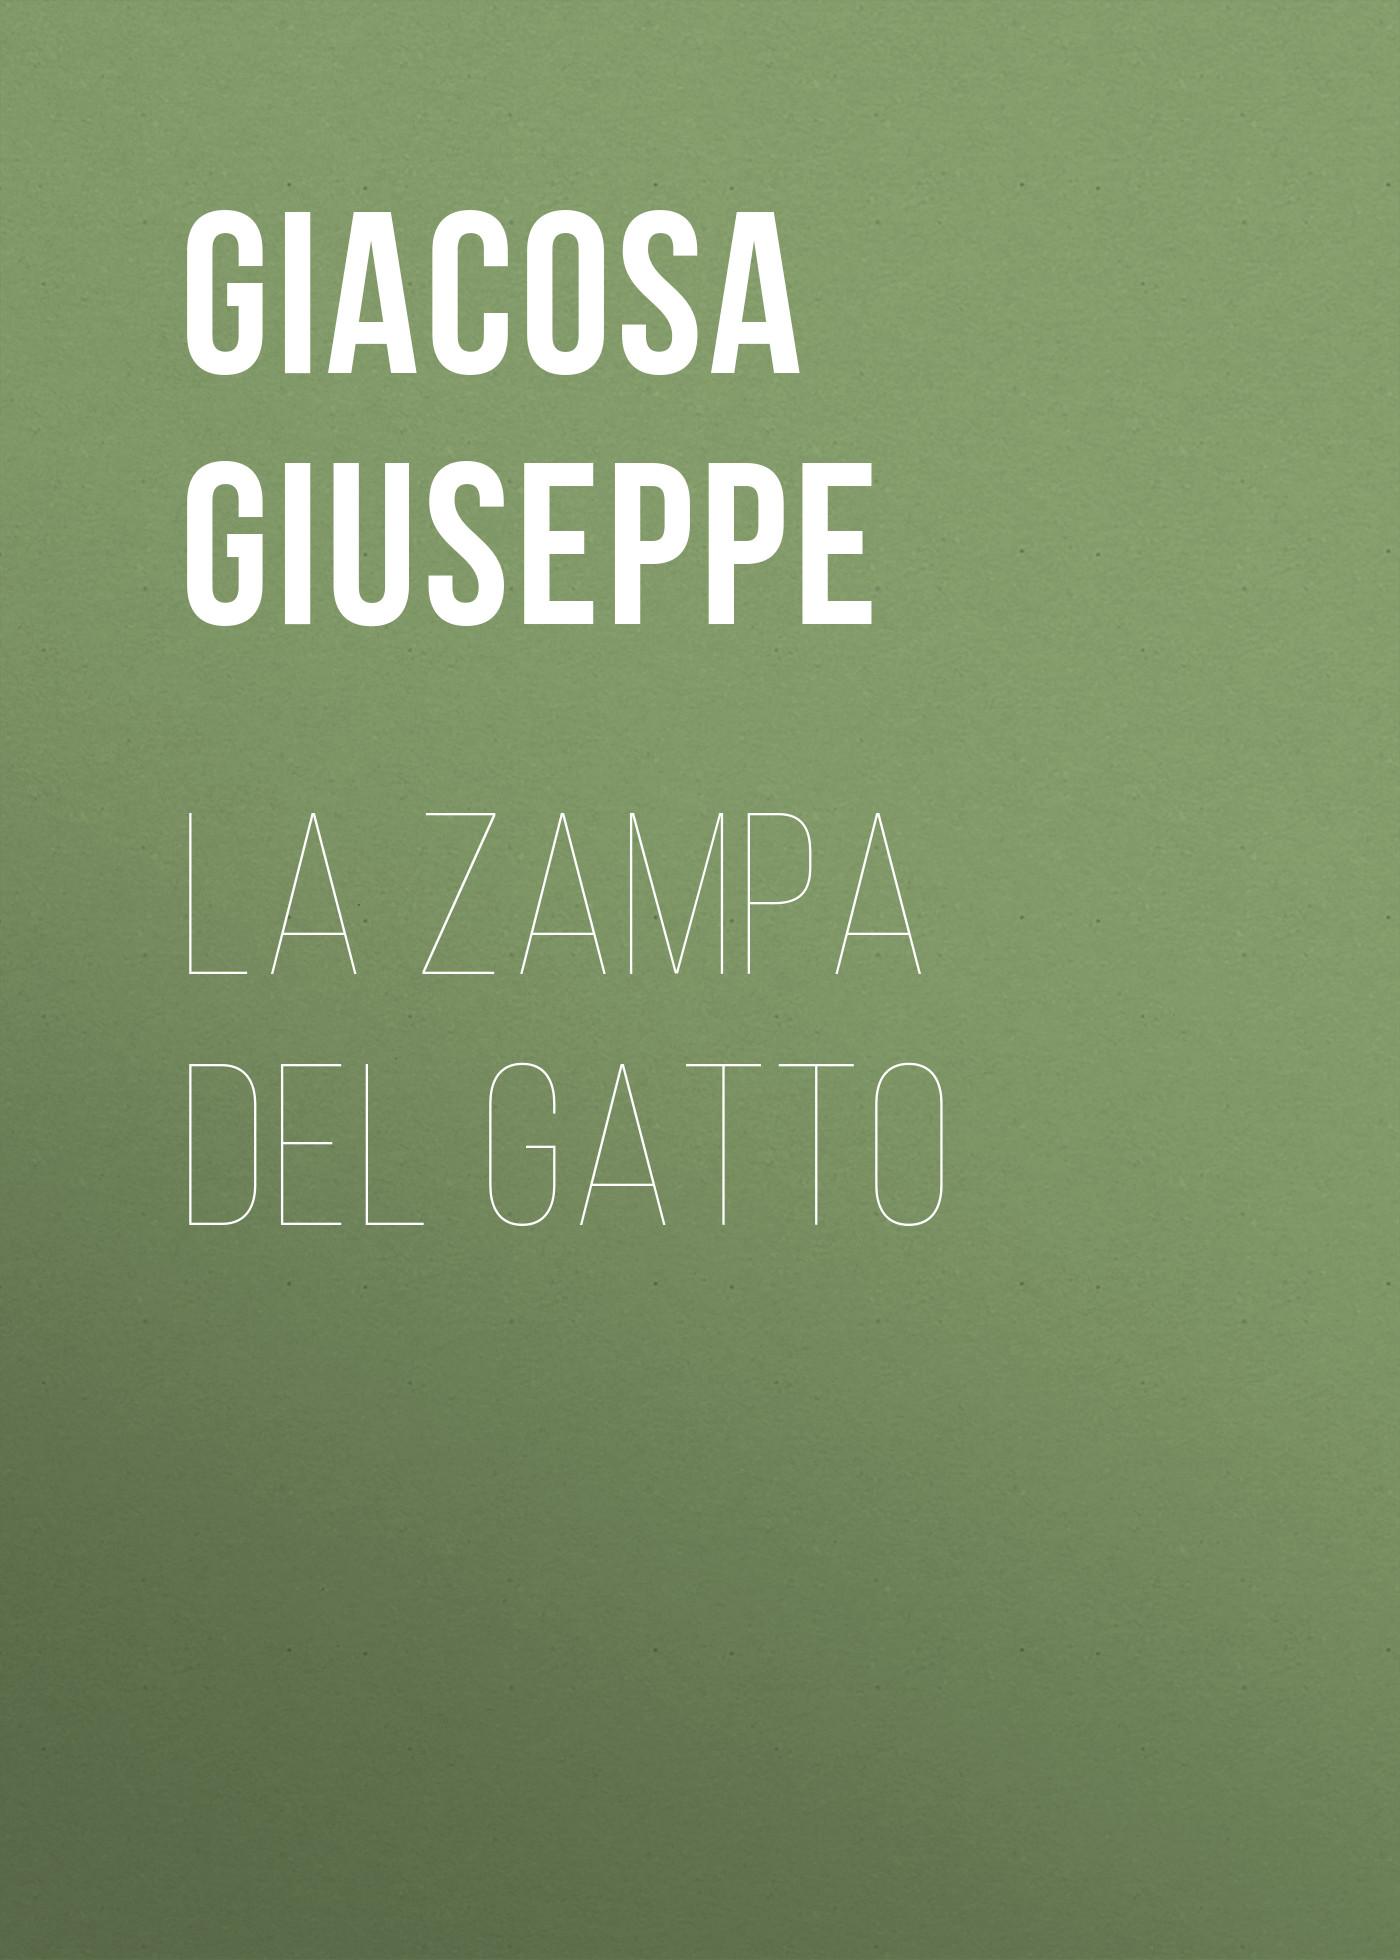 купить Giacosa Giuseppe La zampa del gatto недорого